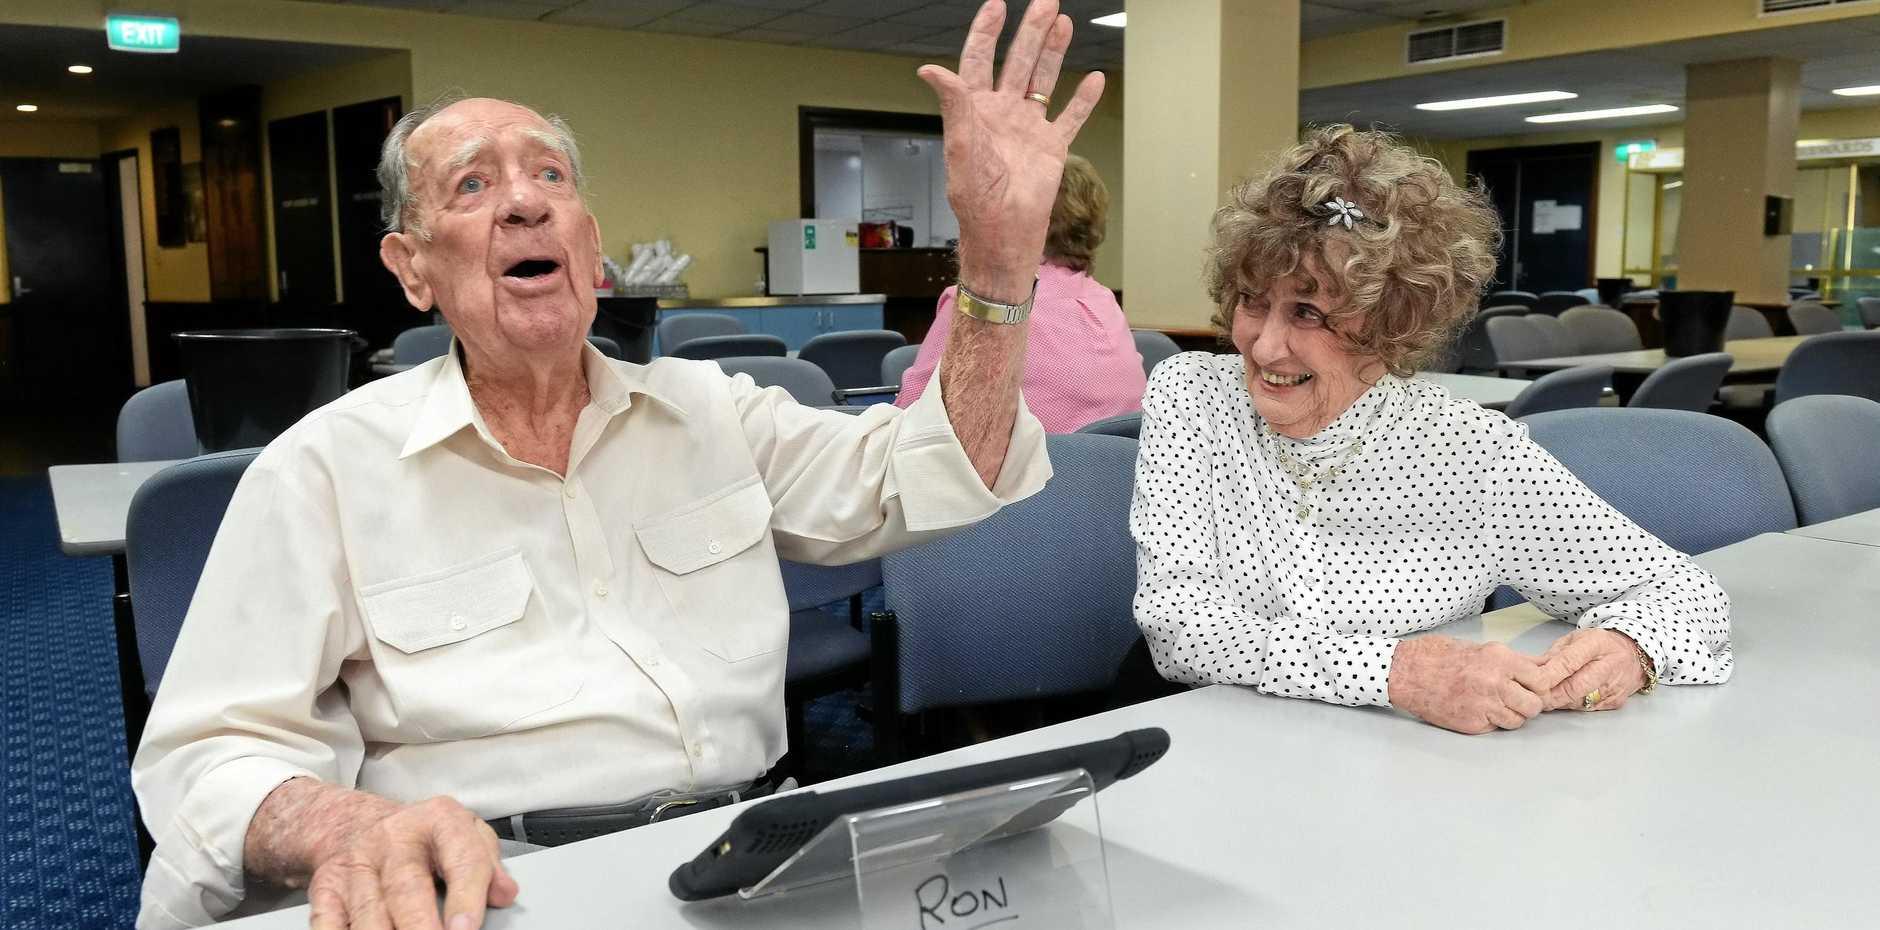 LOVING LIFE: Ron Bateman turns 100. He loves playing bingo at CSI. Here he is calling bingo next to his wife, Fay. His secret? Good food.